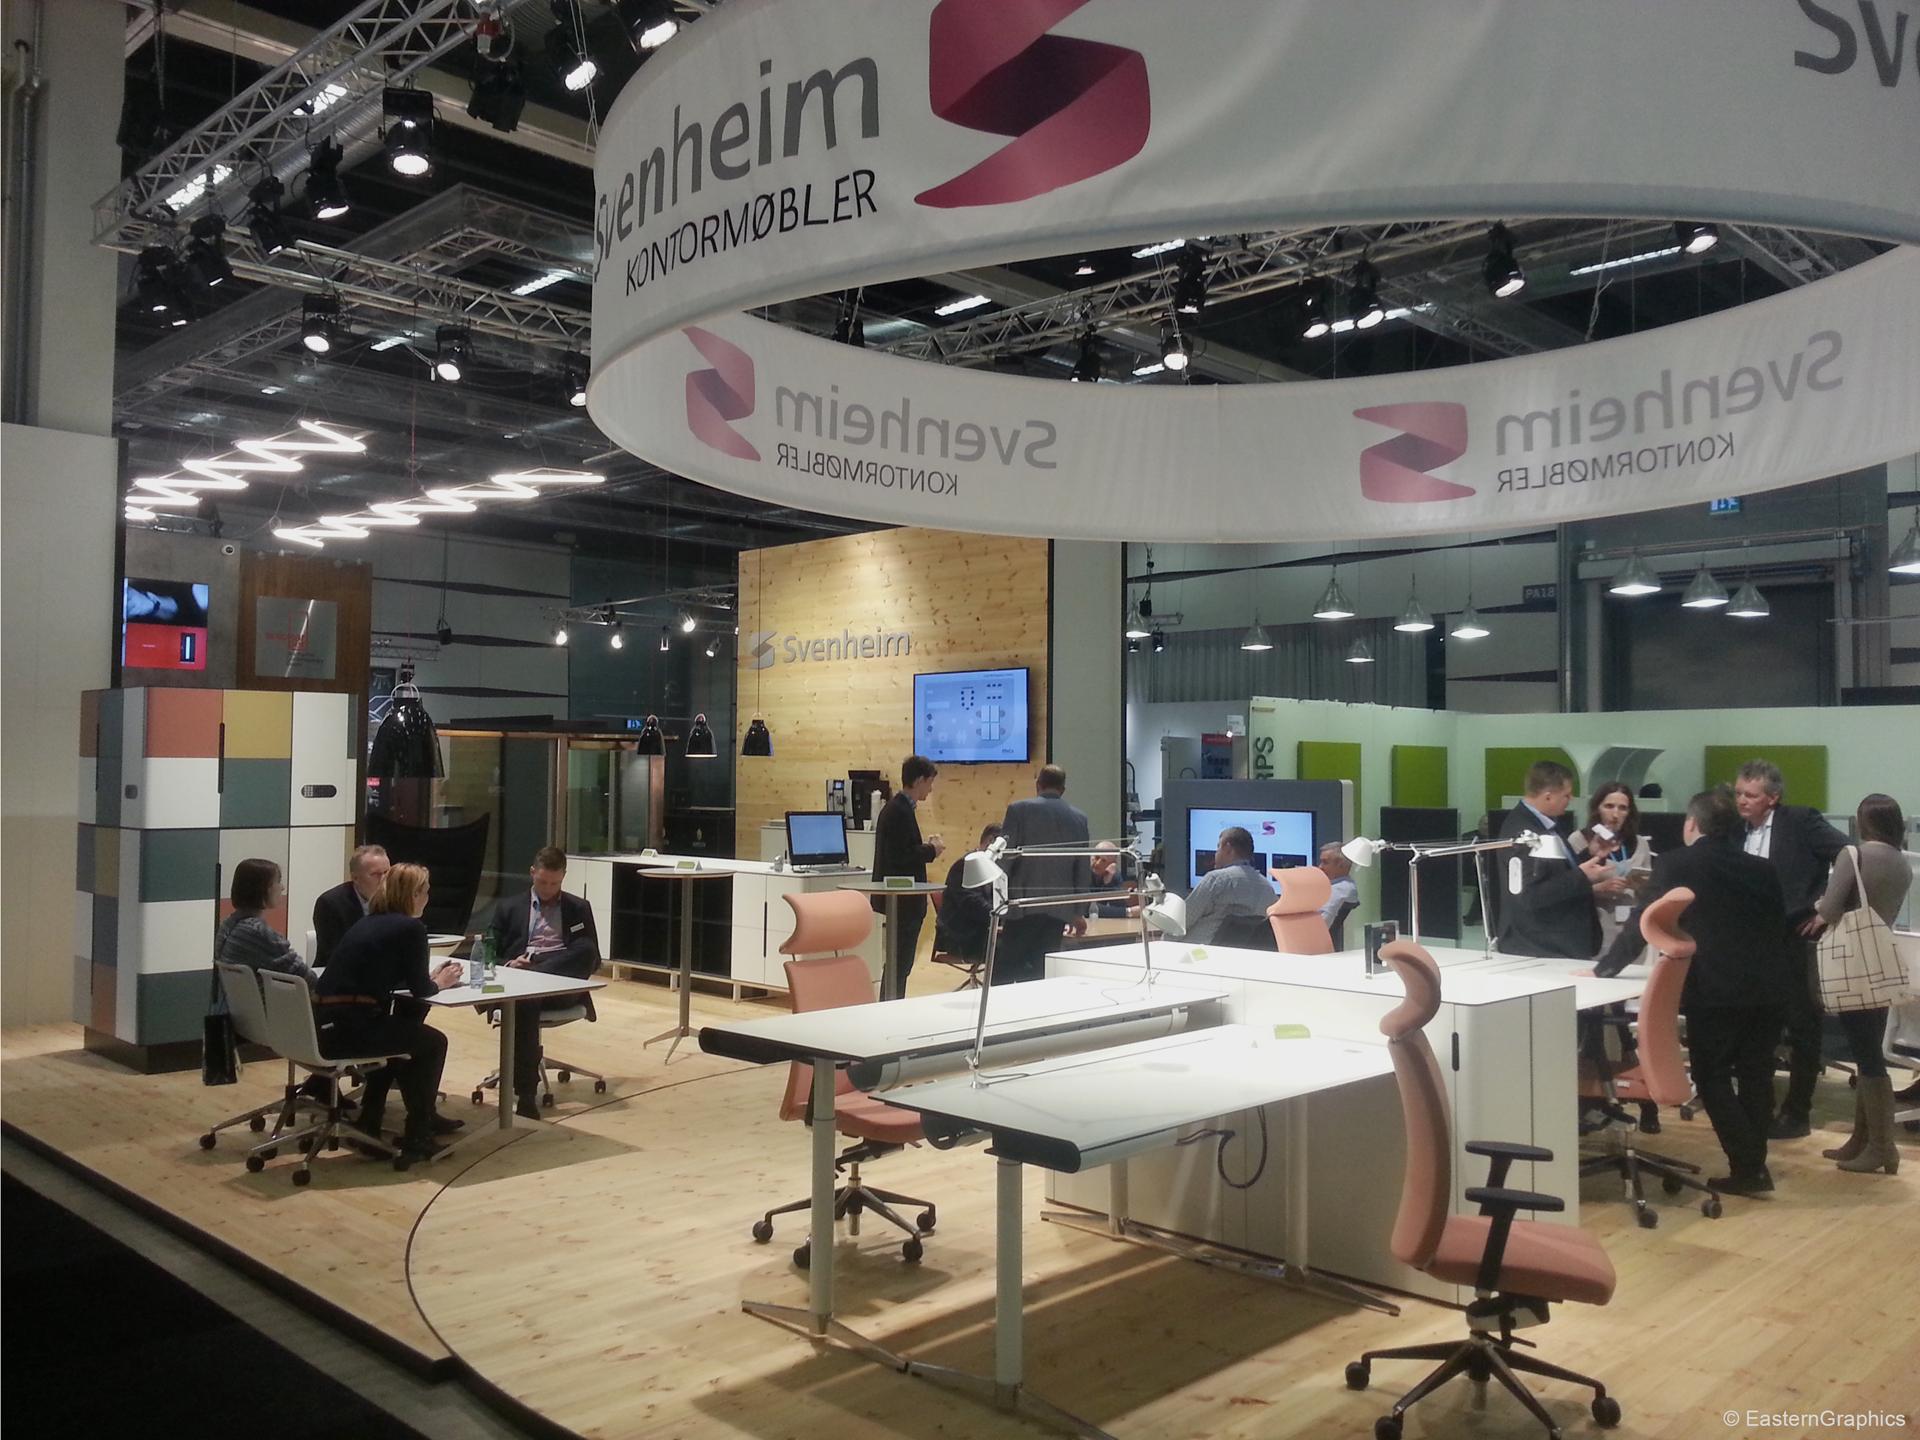 Eindrücke der Stockholm Furniture & Light Fair 2015 - Svenheim